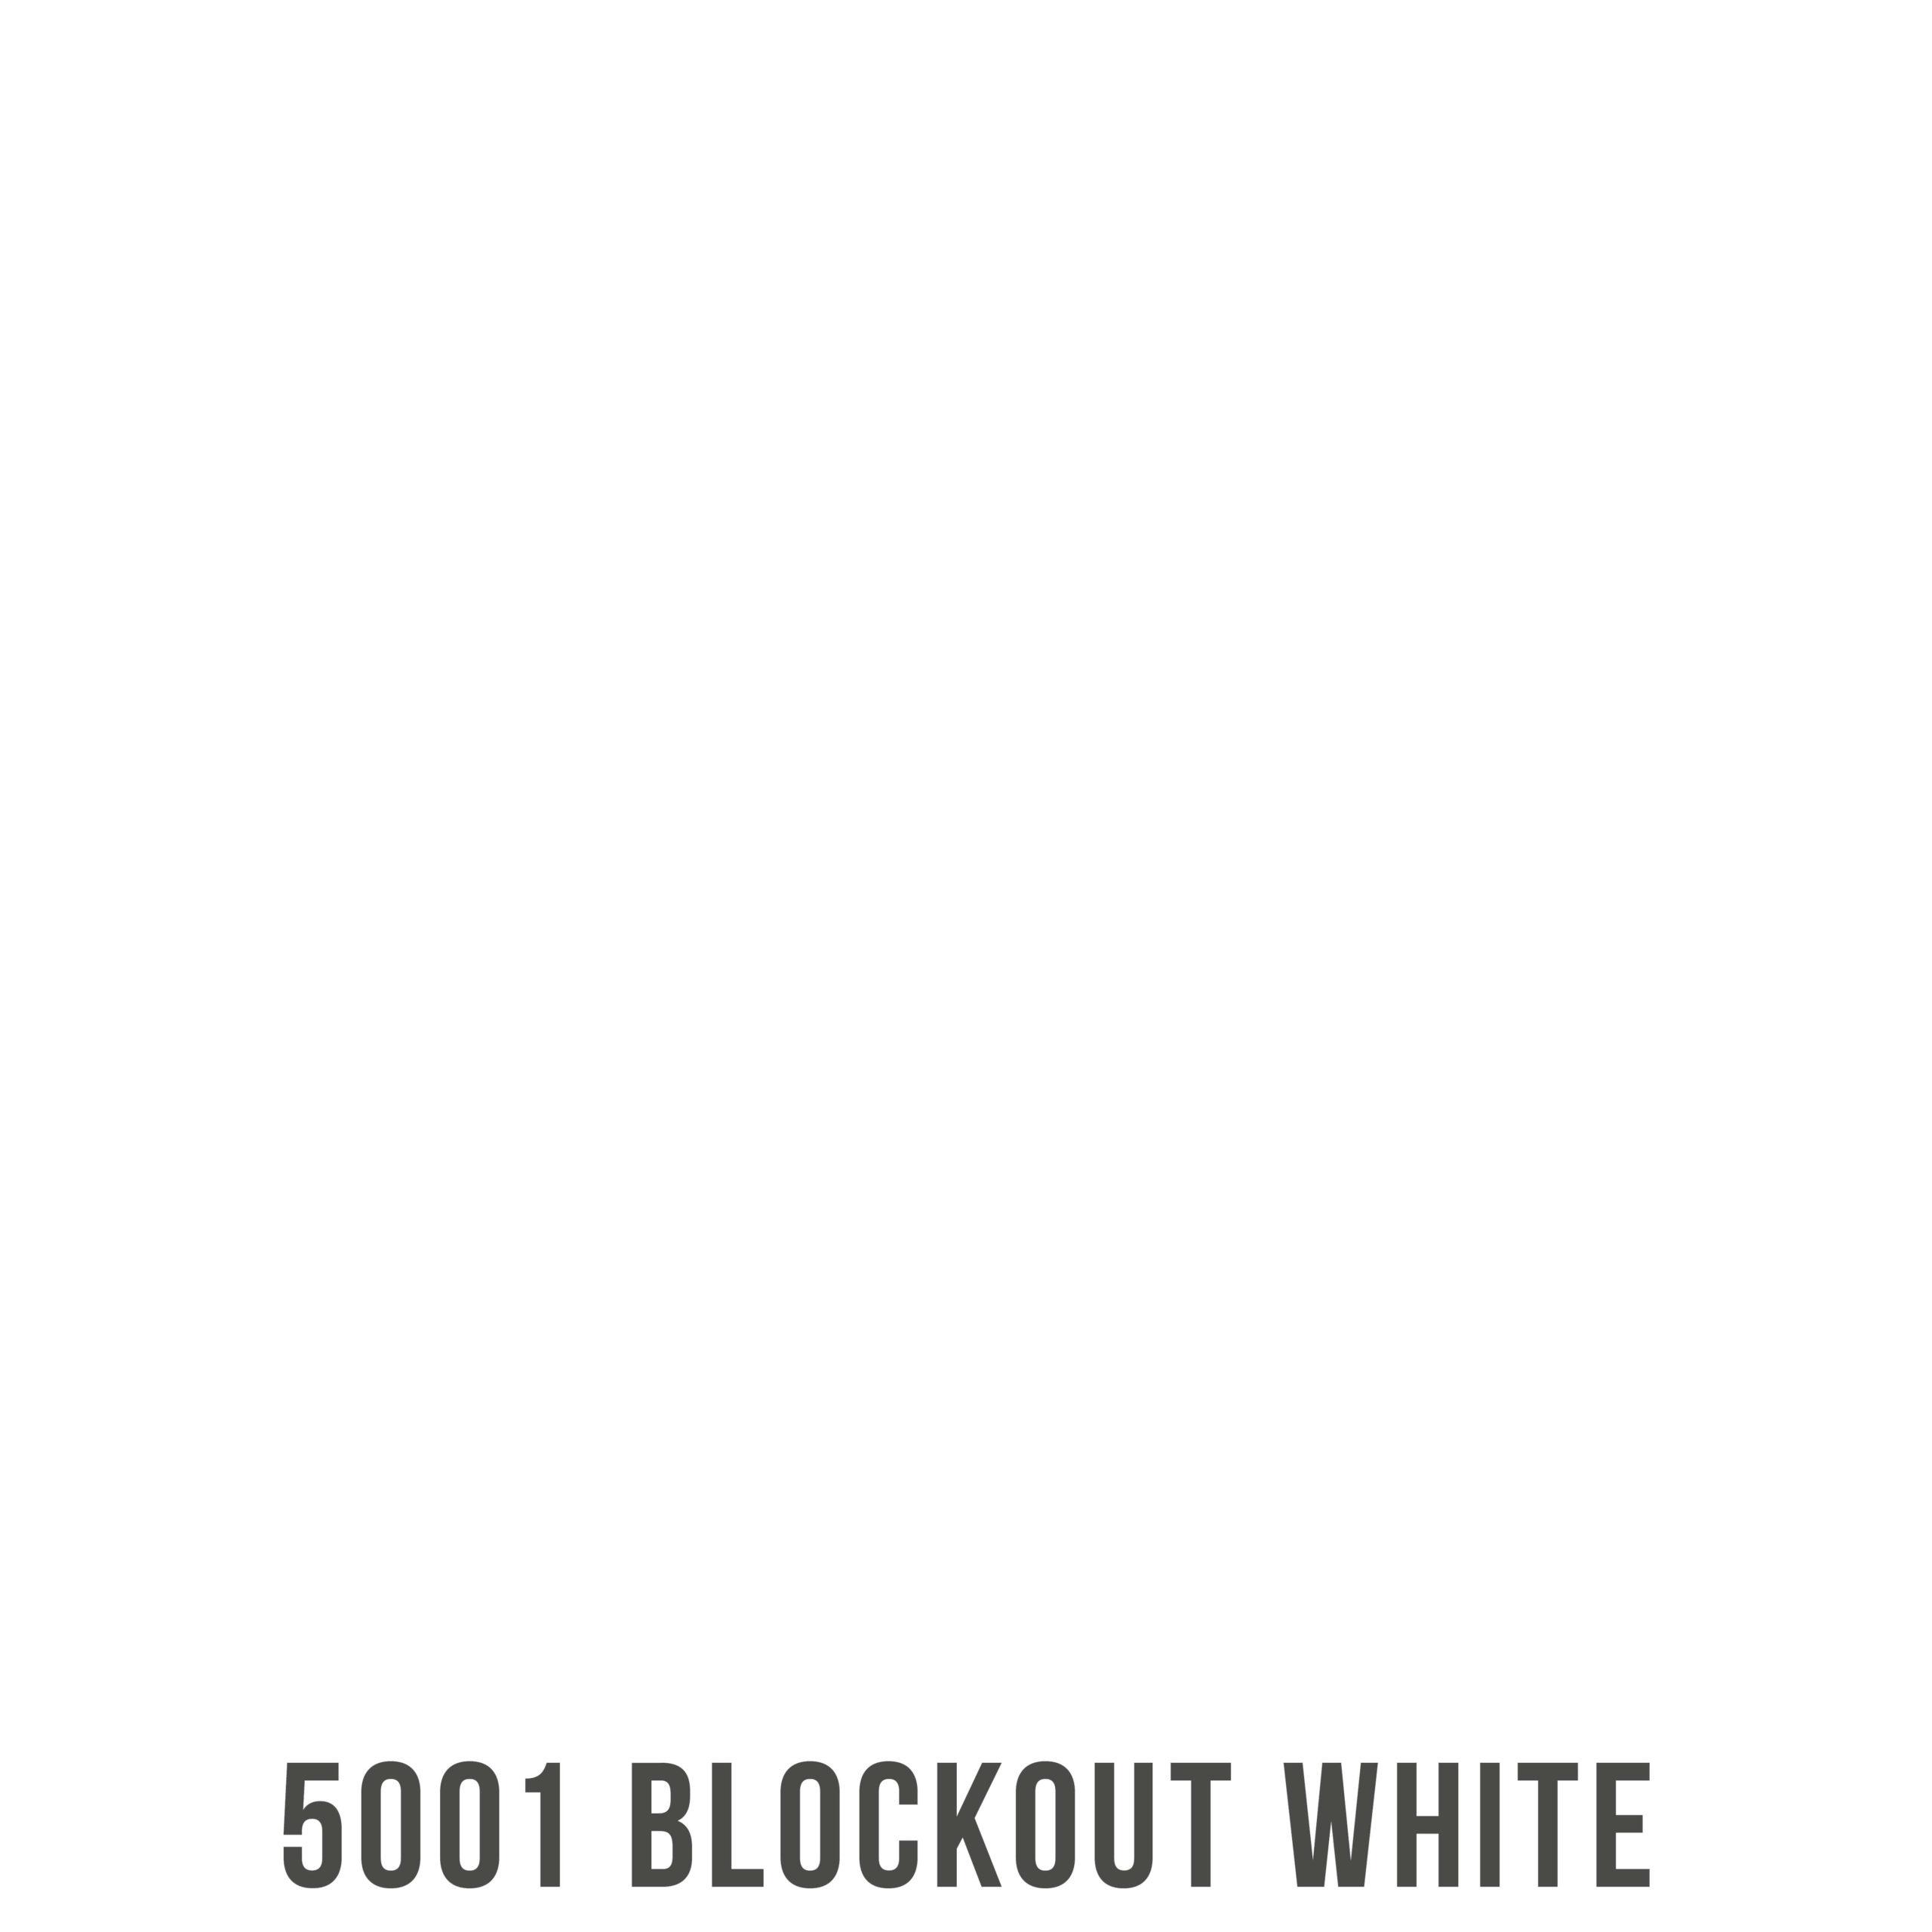 5001 scaled